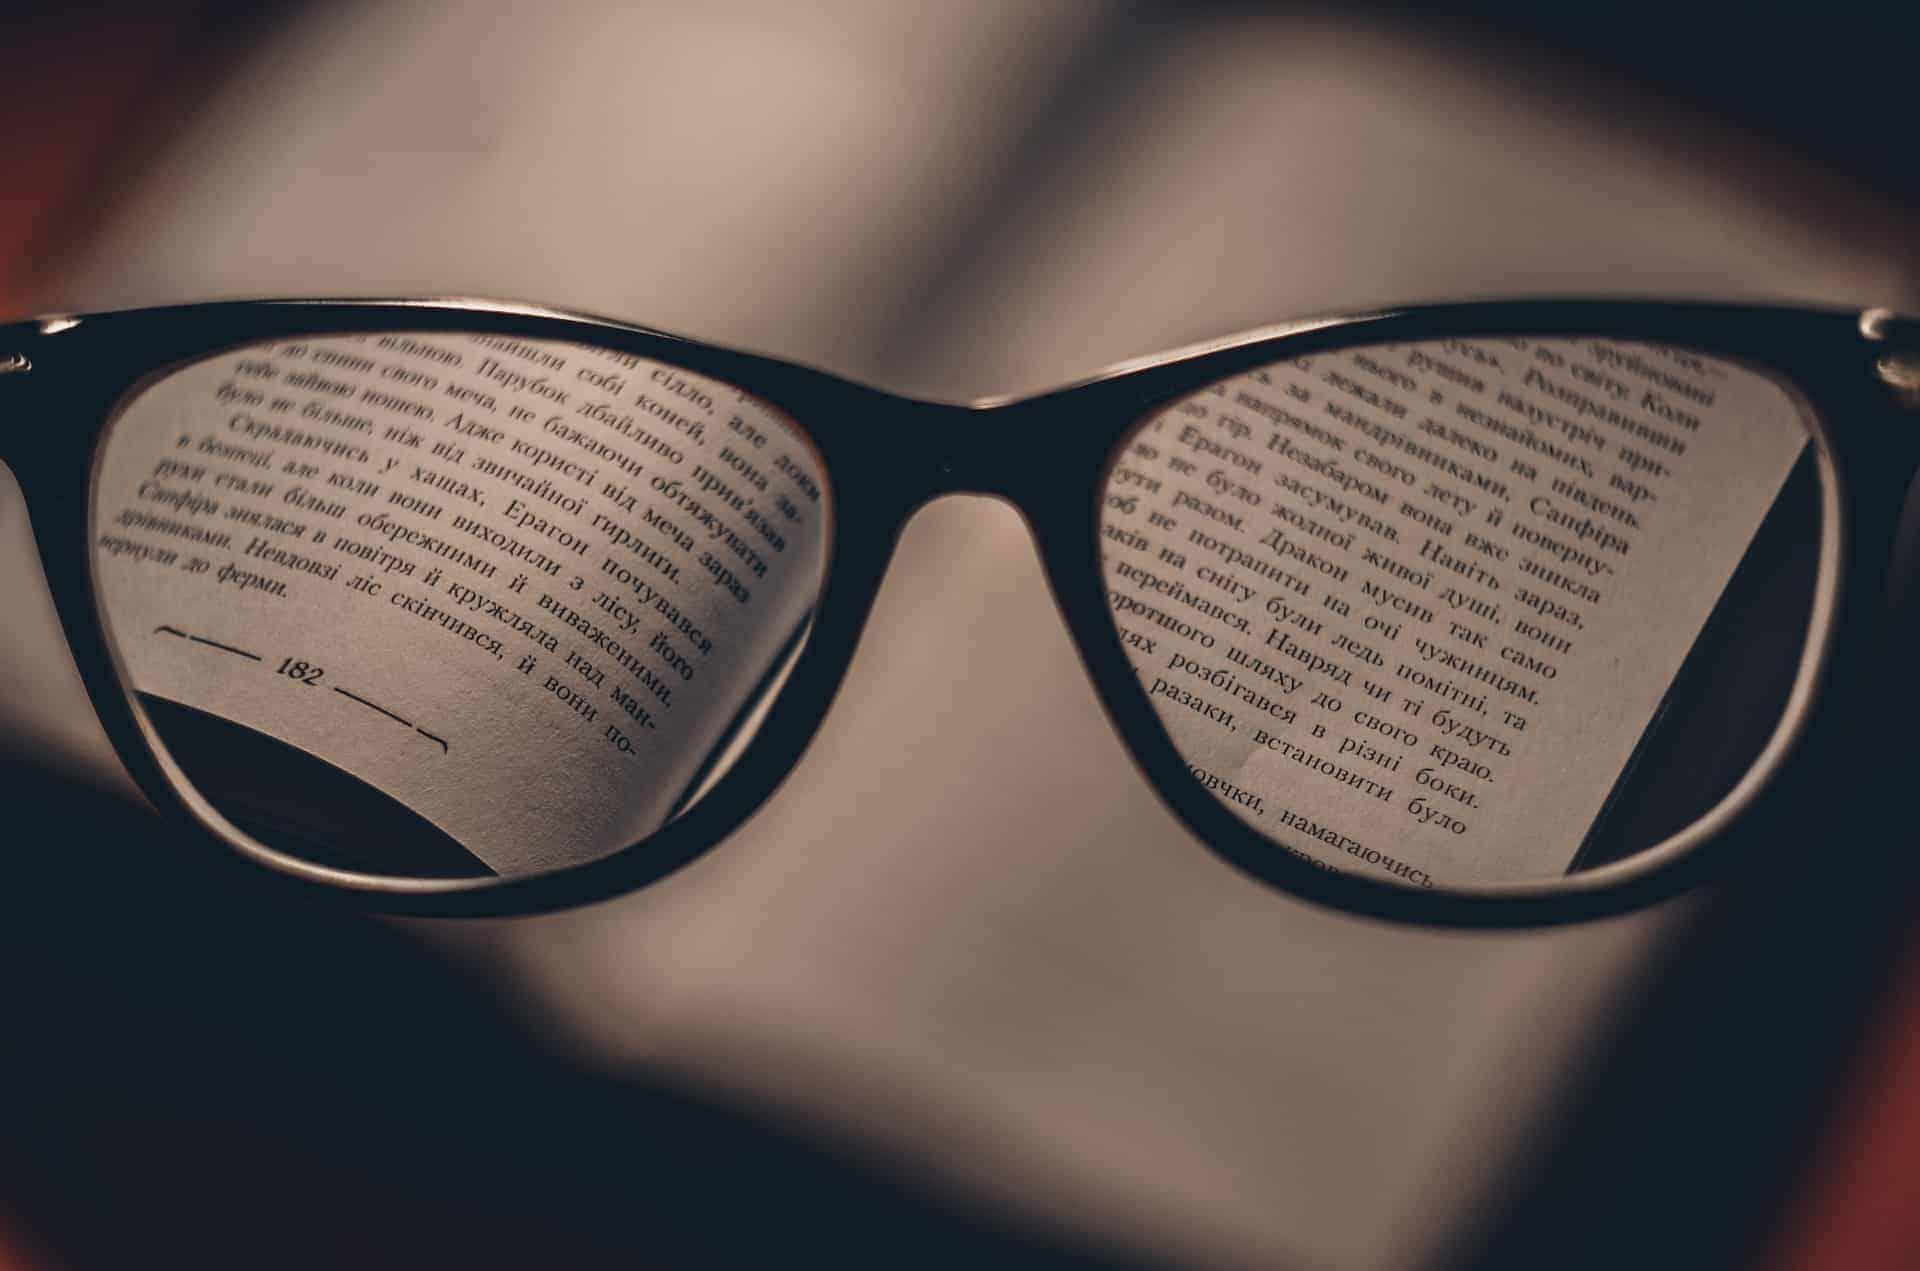 improves vision